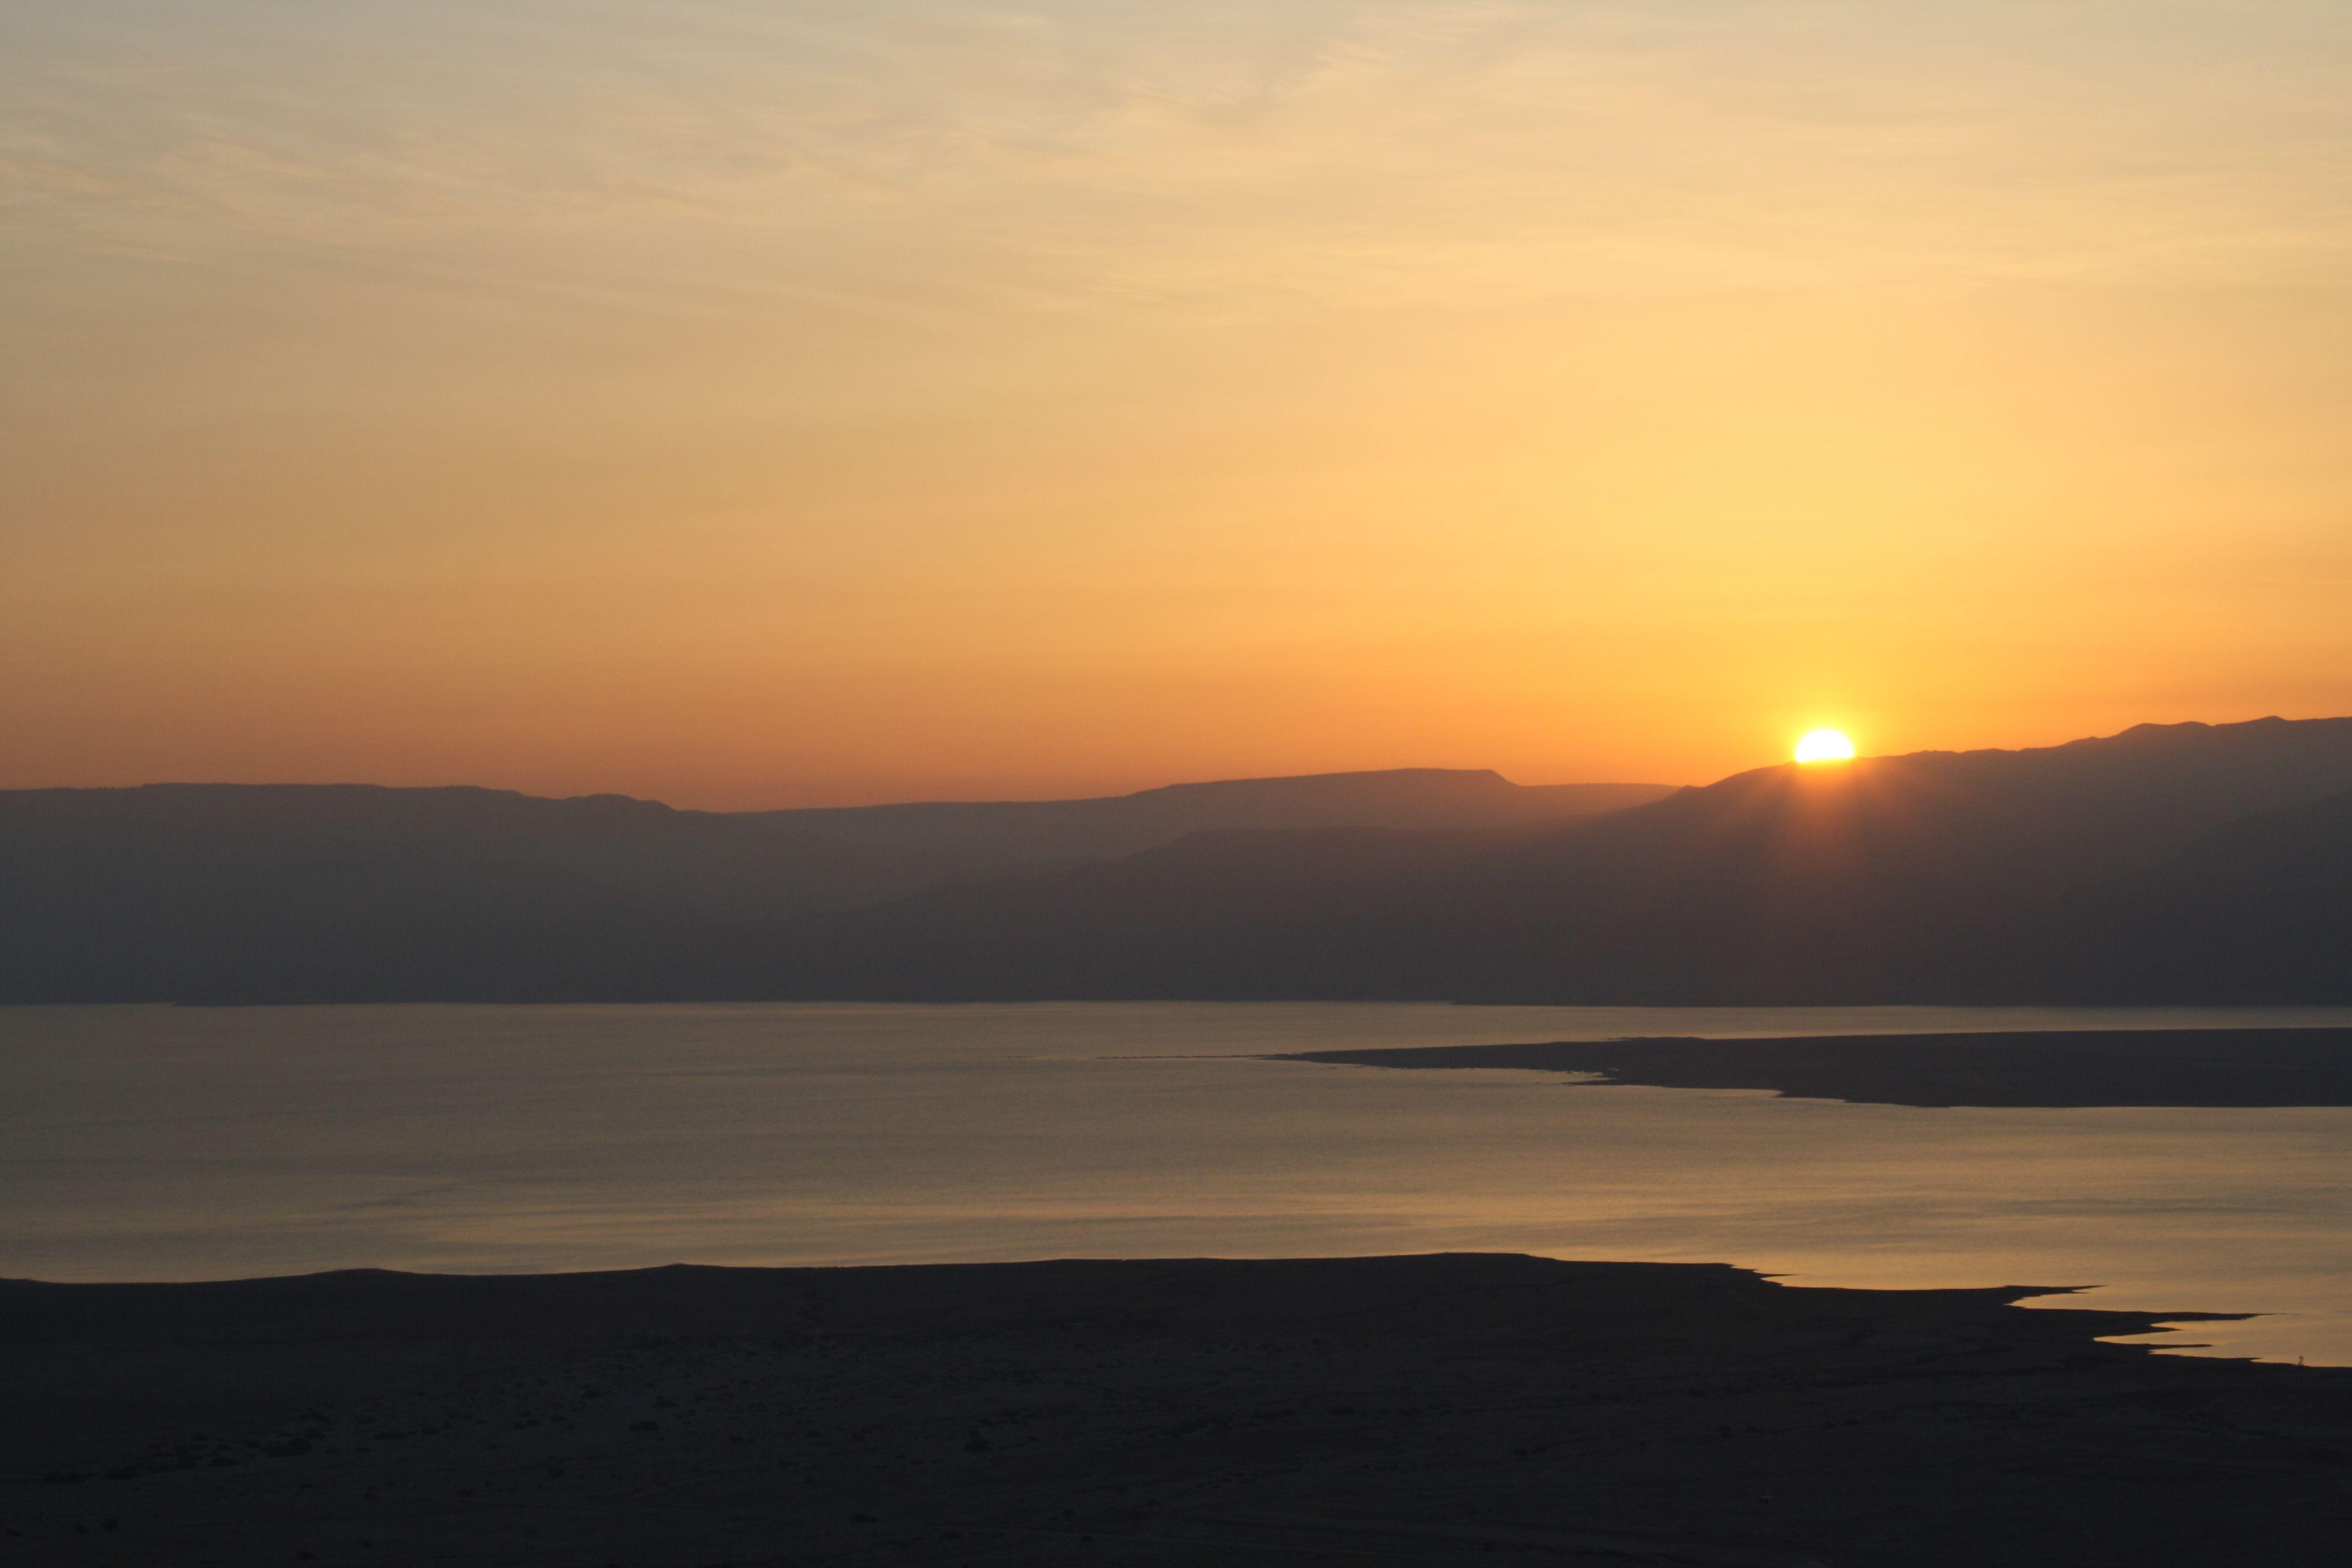 Sunrise at Masada/The Dead Sea, Israel